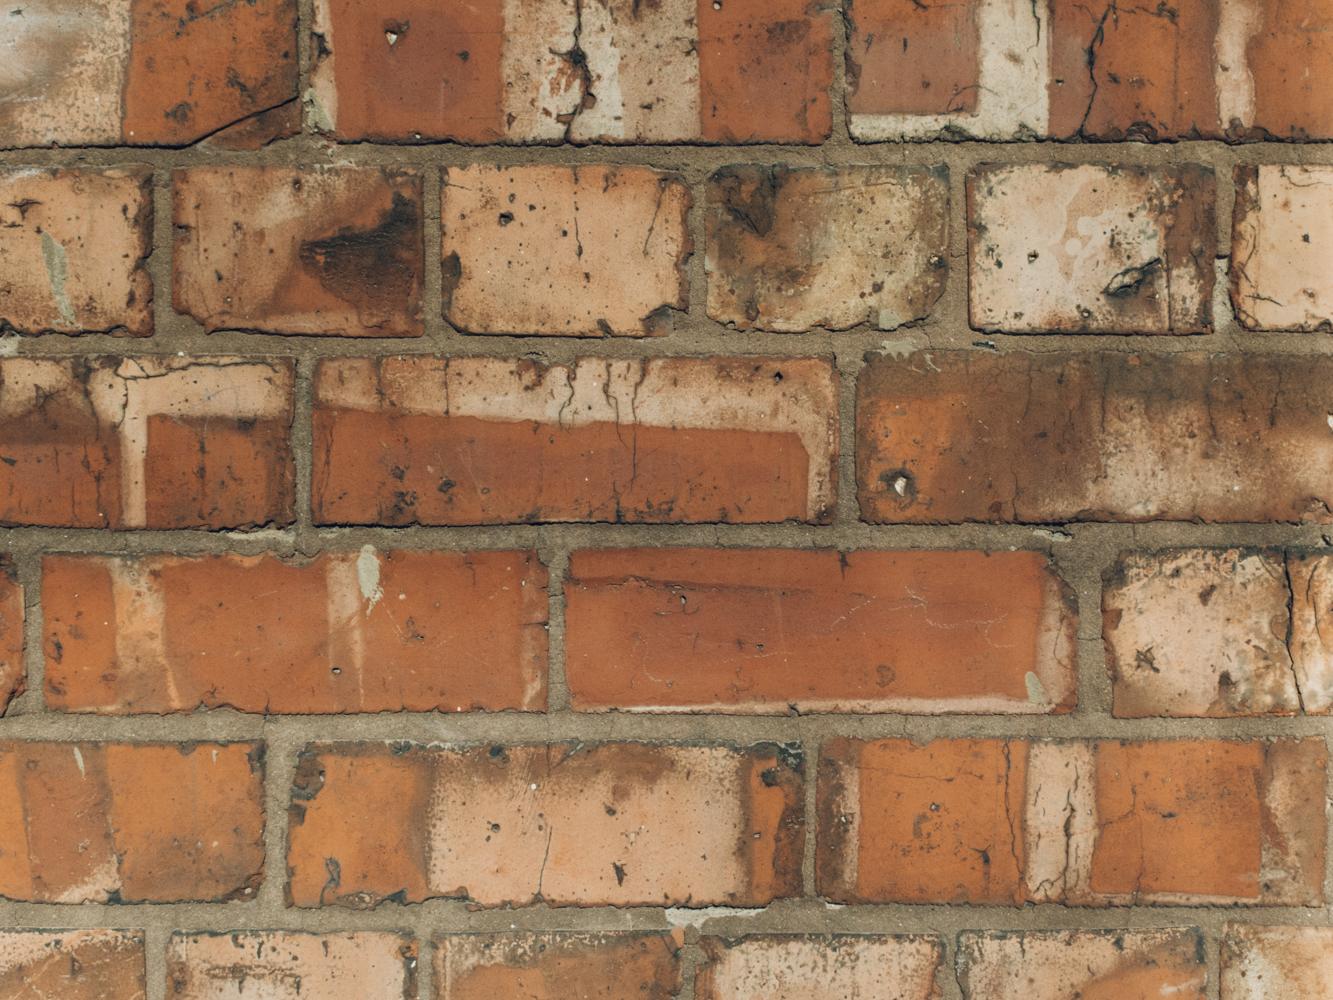 Haarkon Manchester Travel Visit England Sunshine Winter Museum Whitworth Art Gallery Brick Material